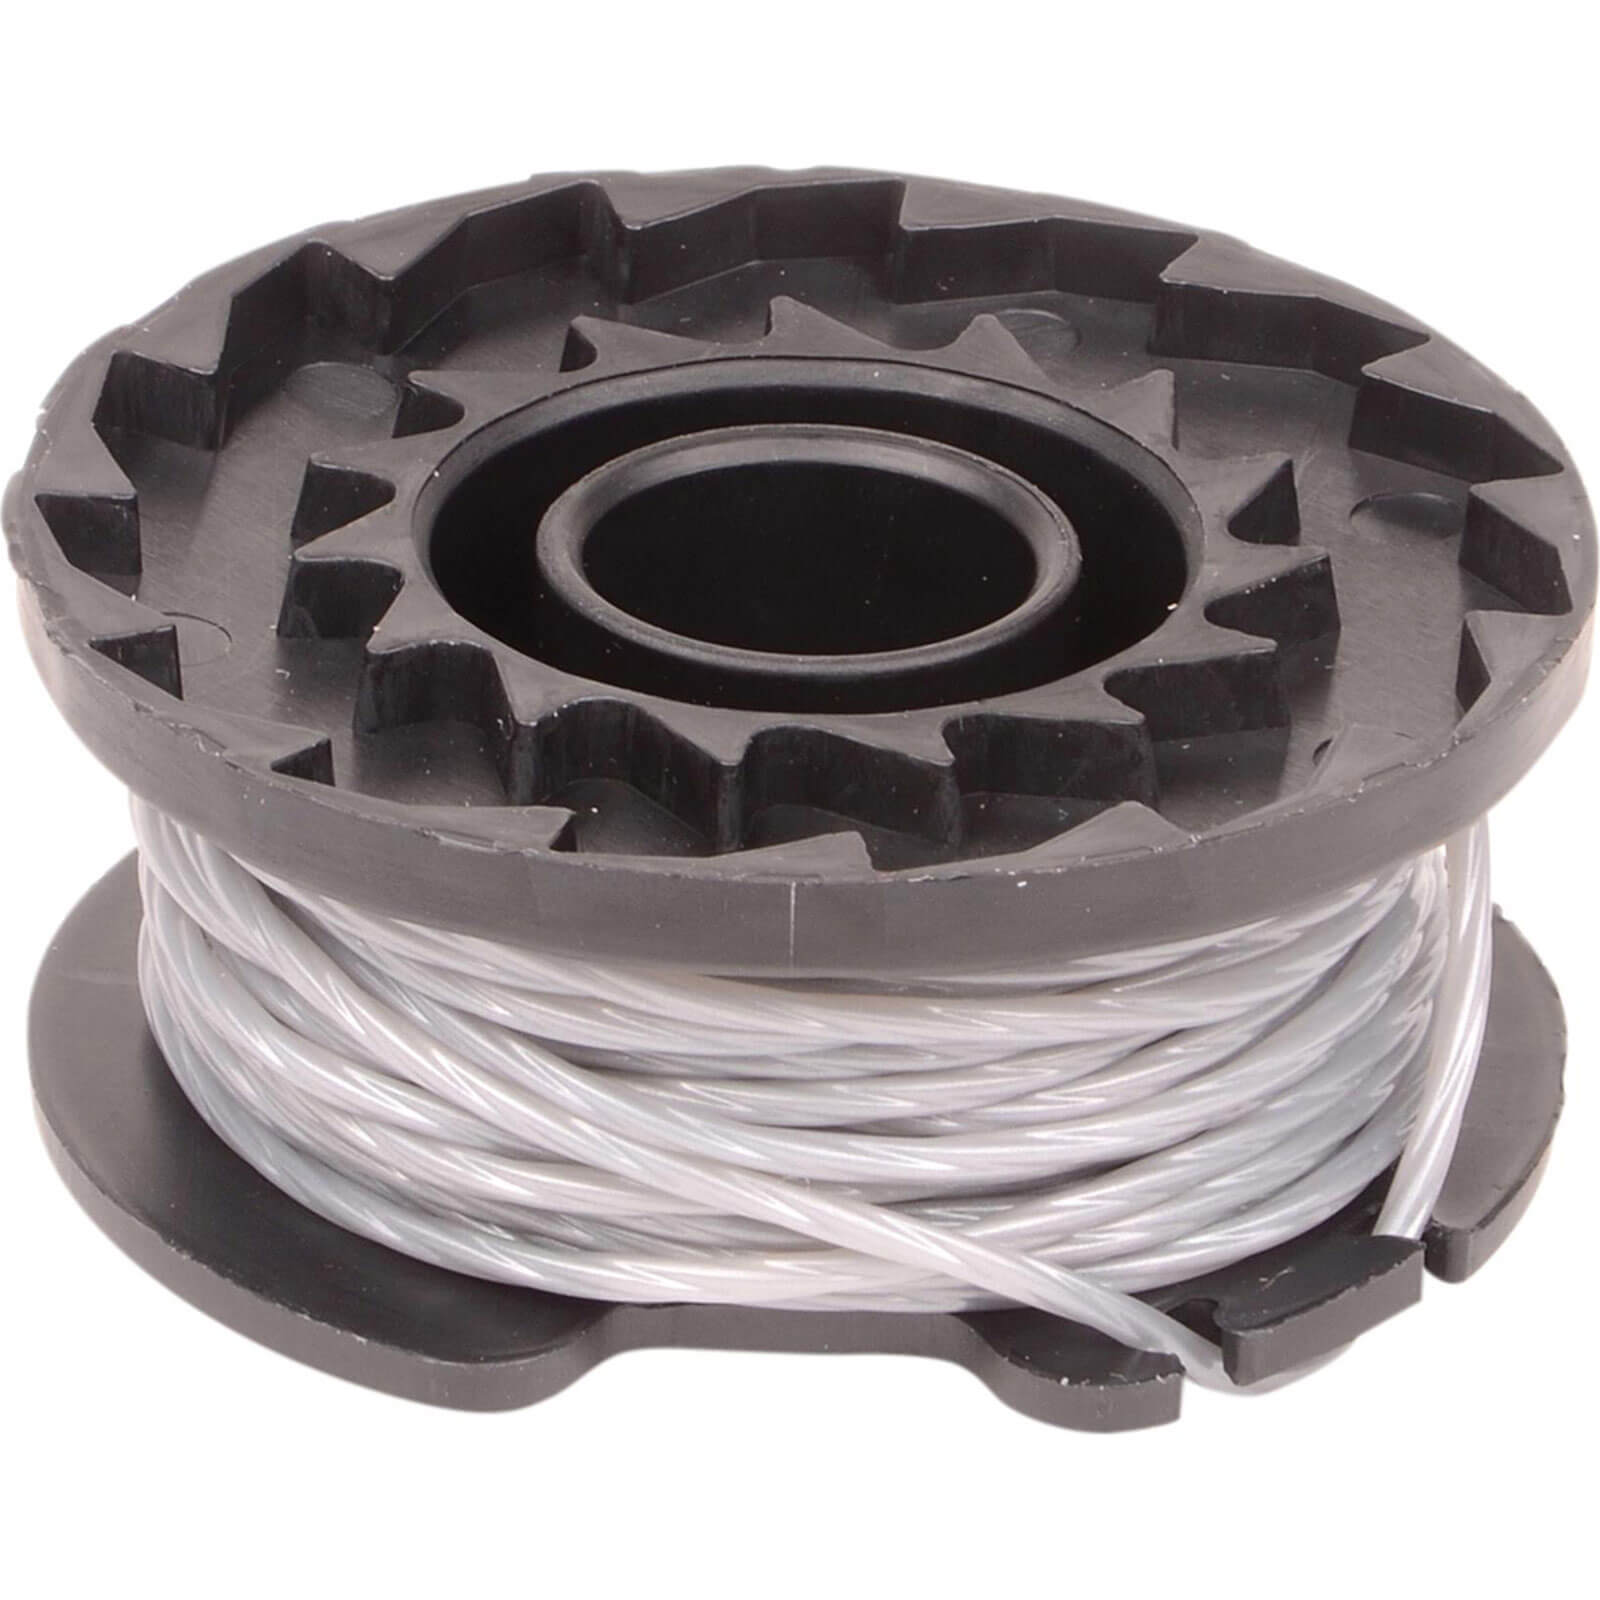 ALM 1.5mm x 6m Spool & Line for Ryobi RLT36, RLT36B & RLT36C33 Grass Trimmers